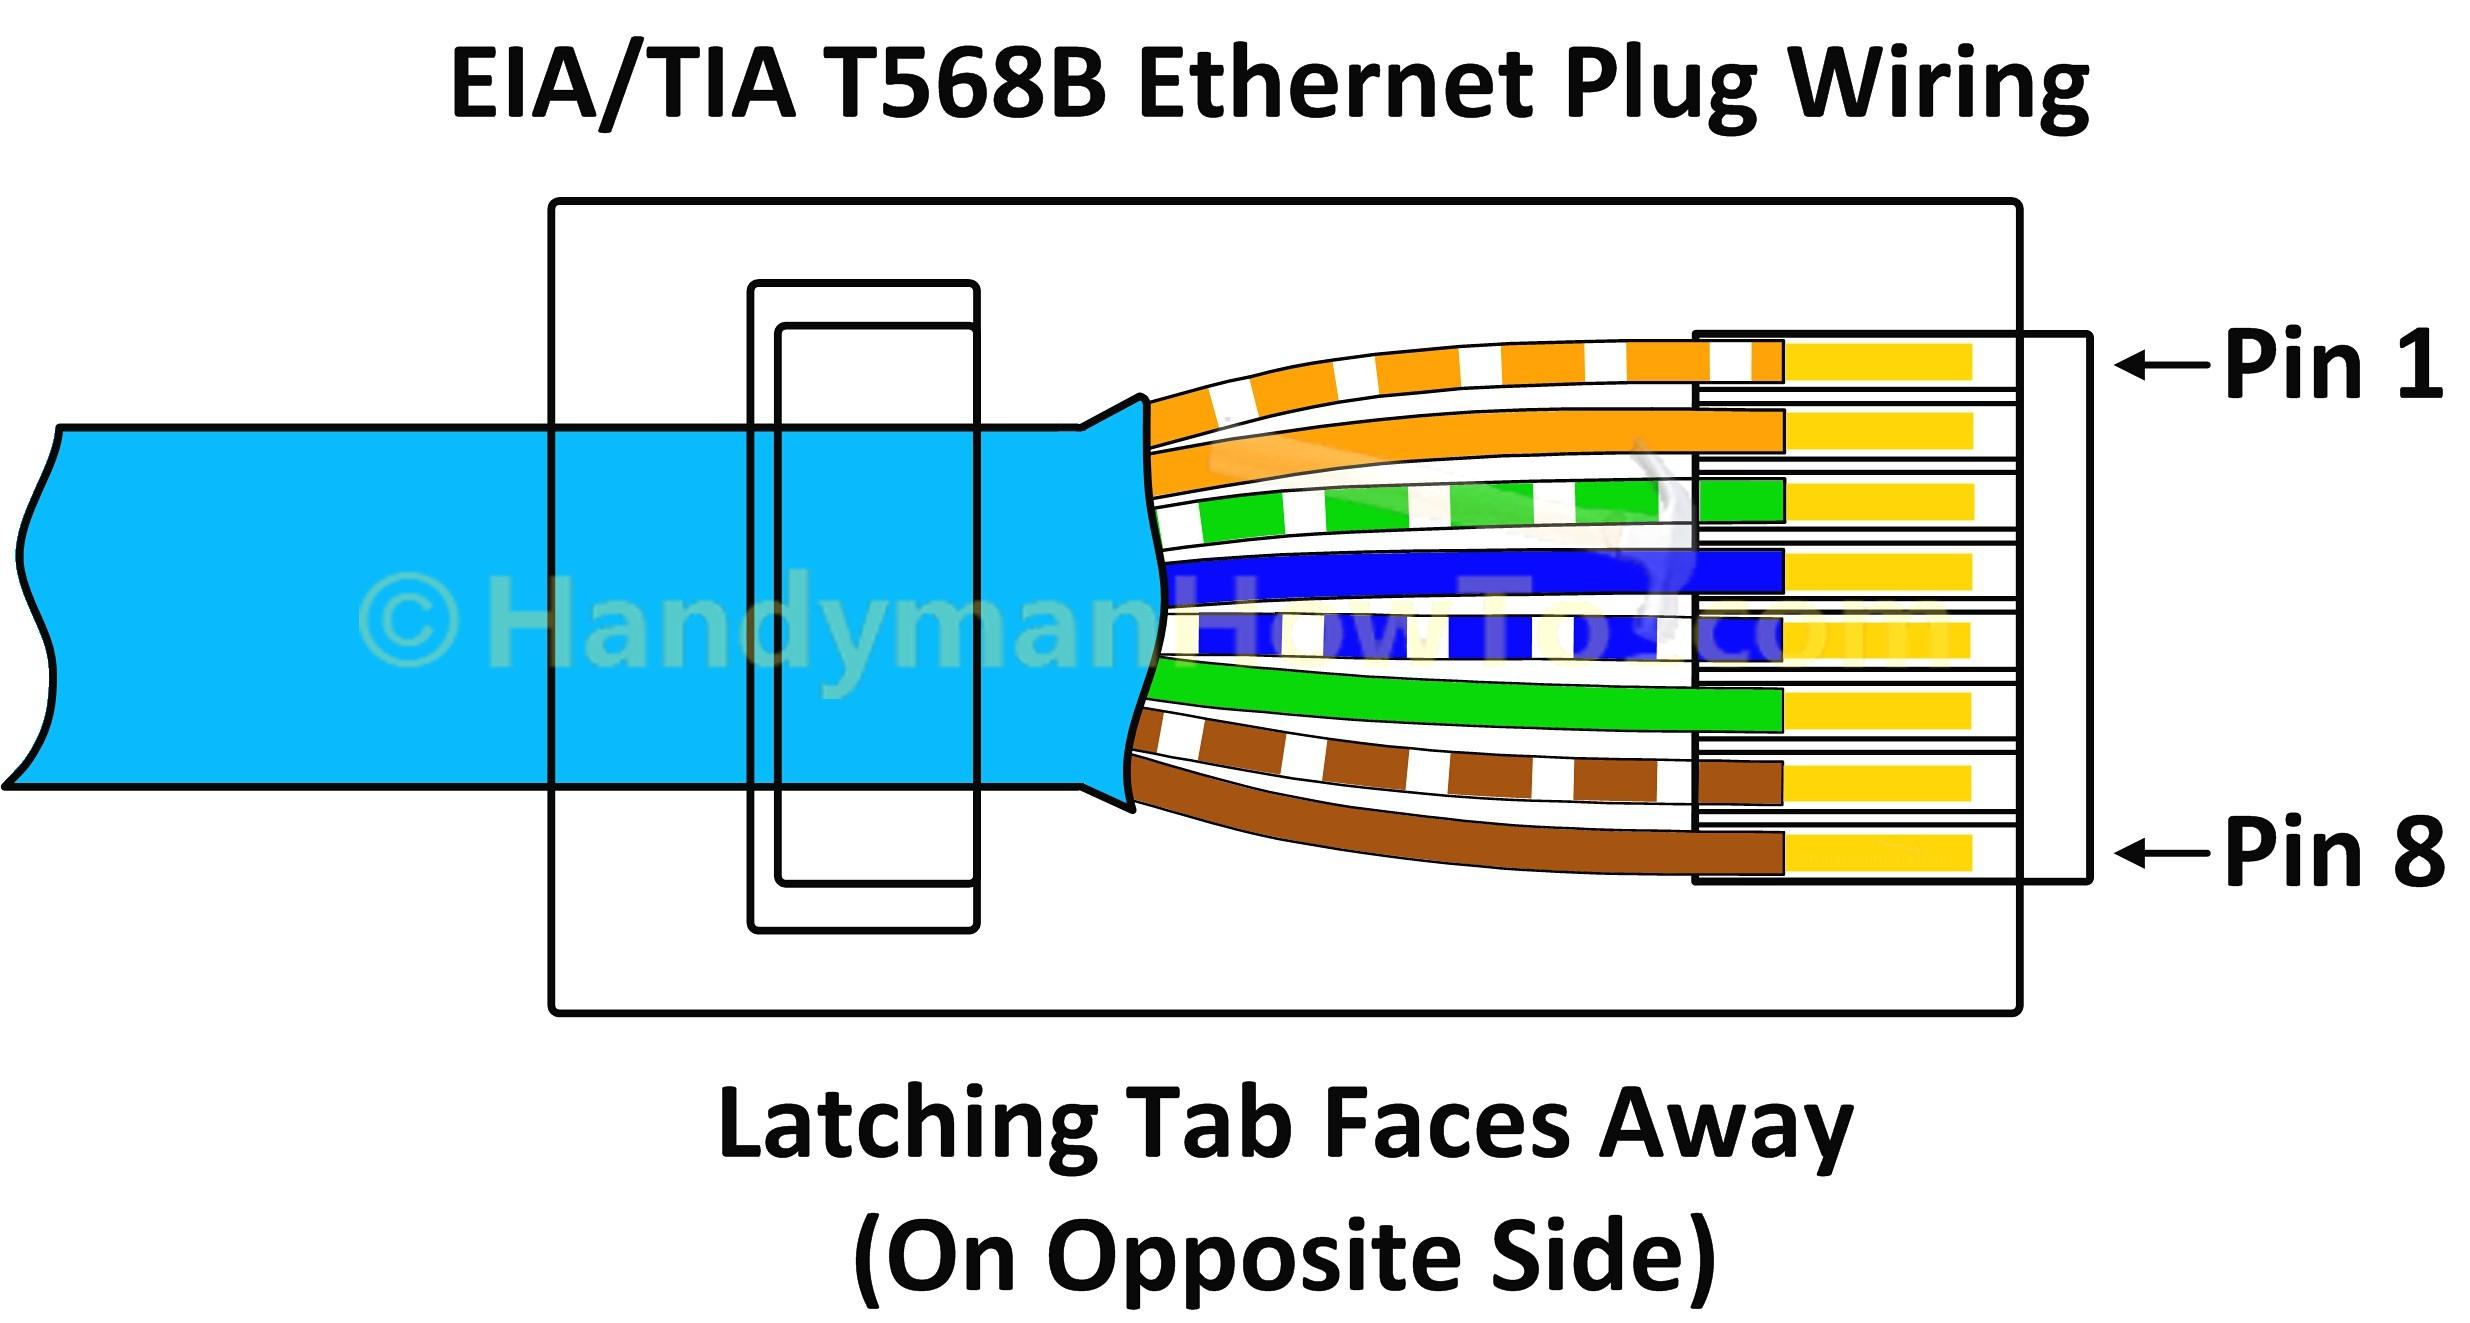 Cat5 Jack Wiring Diagram Cat5e Wiring Diagram 568b Wiring Info • Of Cat5 Jack Wiring Diagram